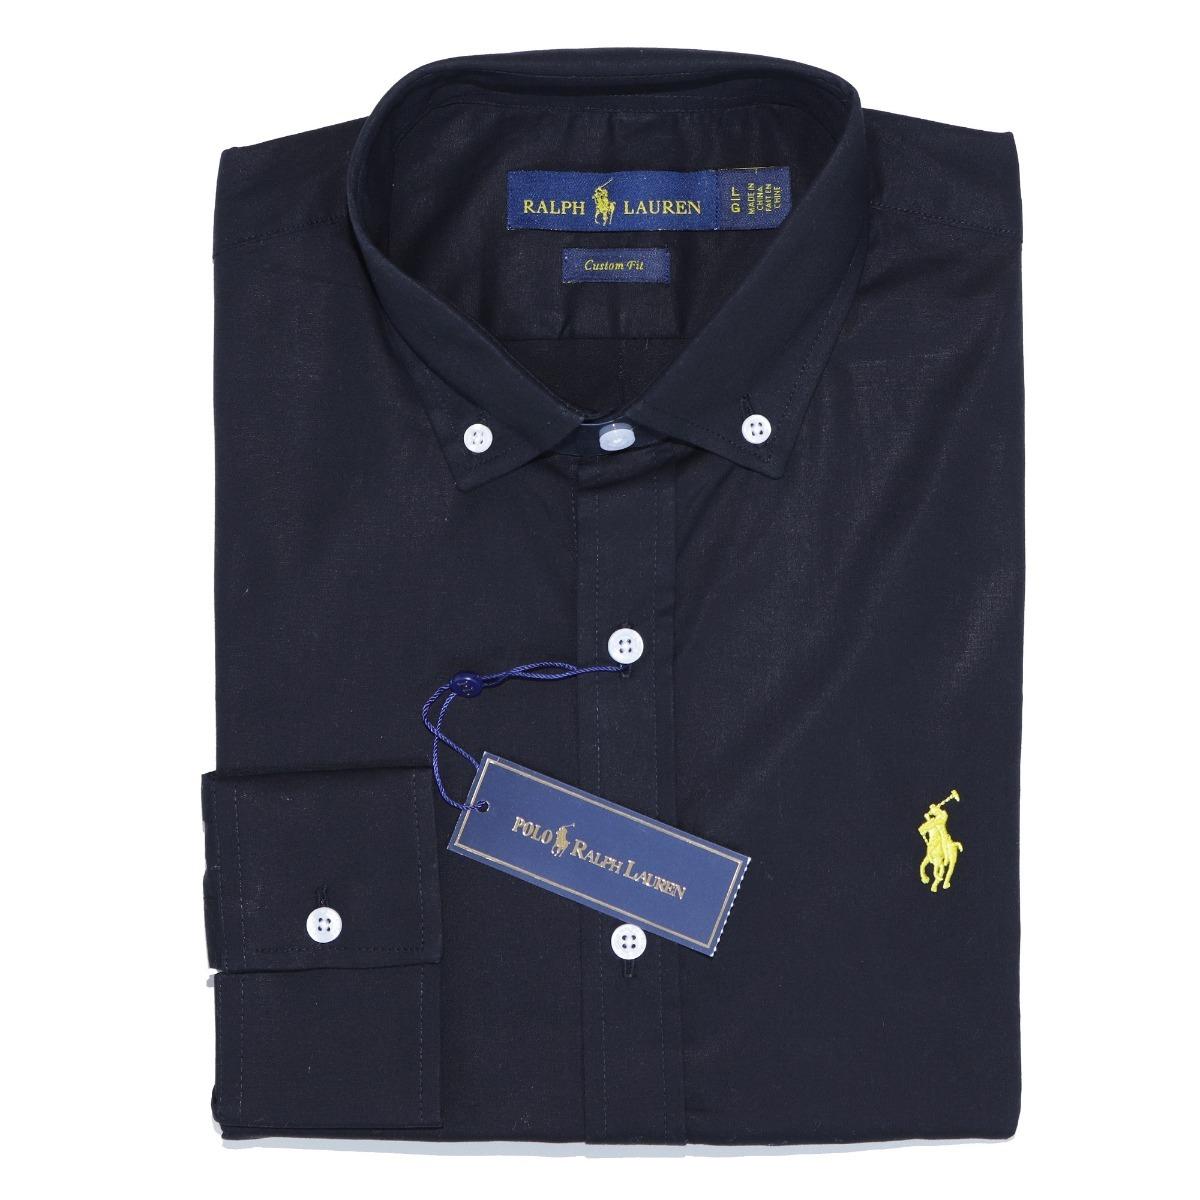 camisa social ralph lauren csfit preta pony amarelo original. Carregando  zoom. 27fcfcb101f